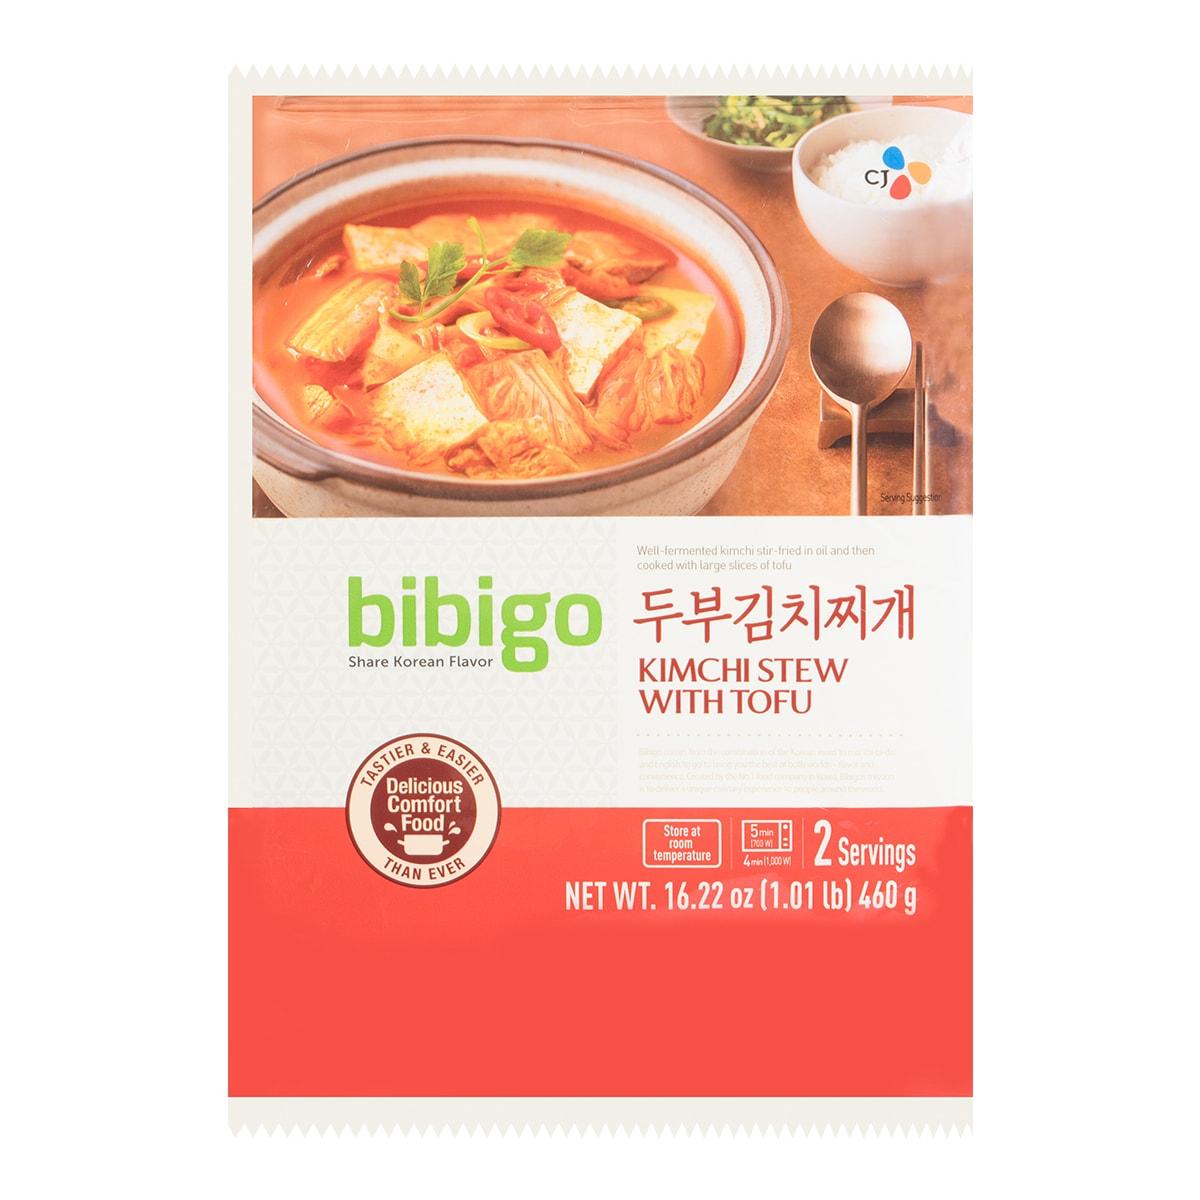 CJ Kimchi Stew with Tofu 460g